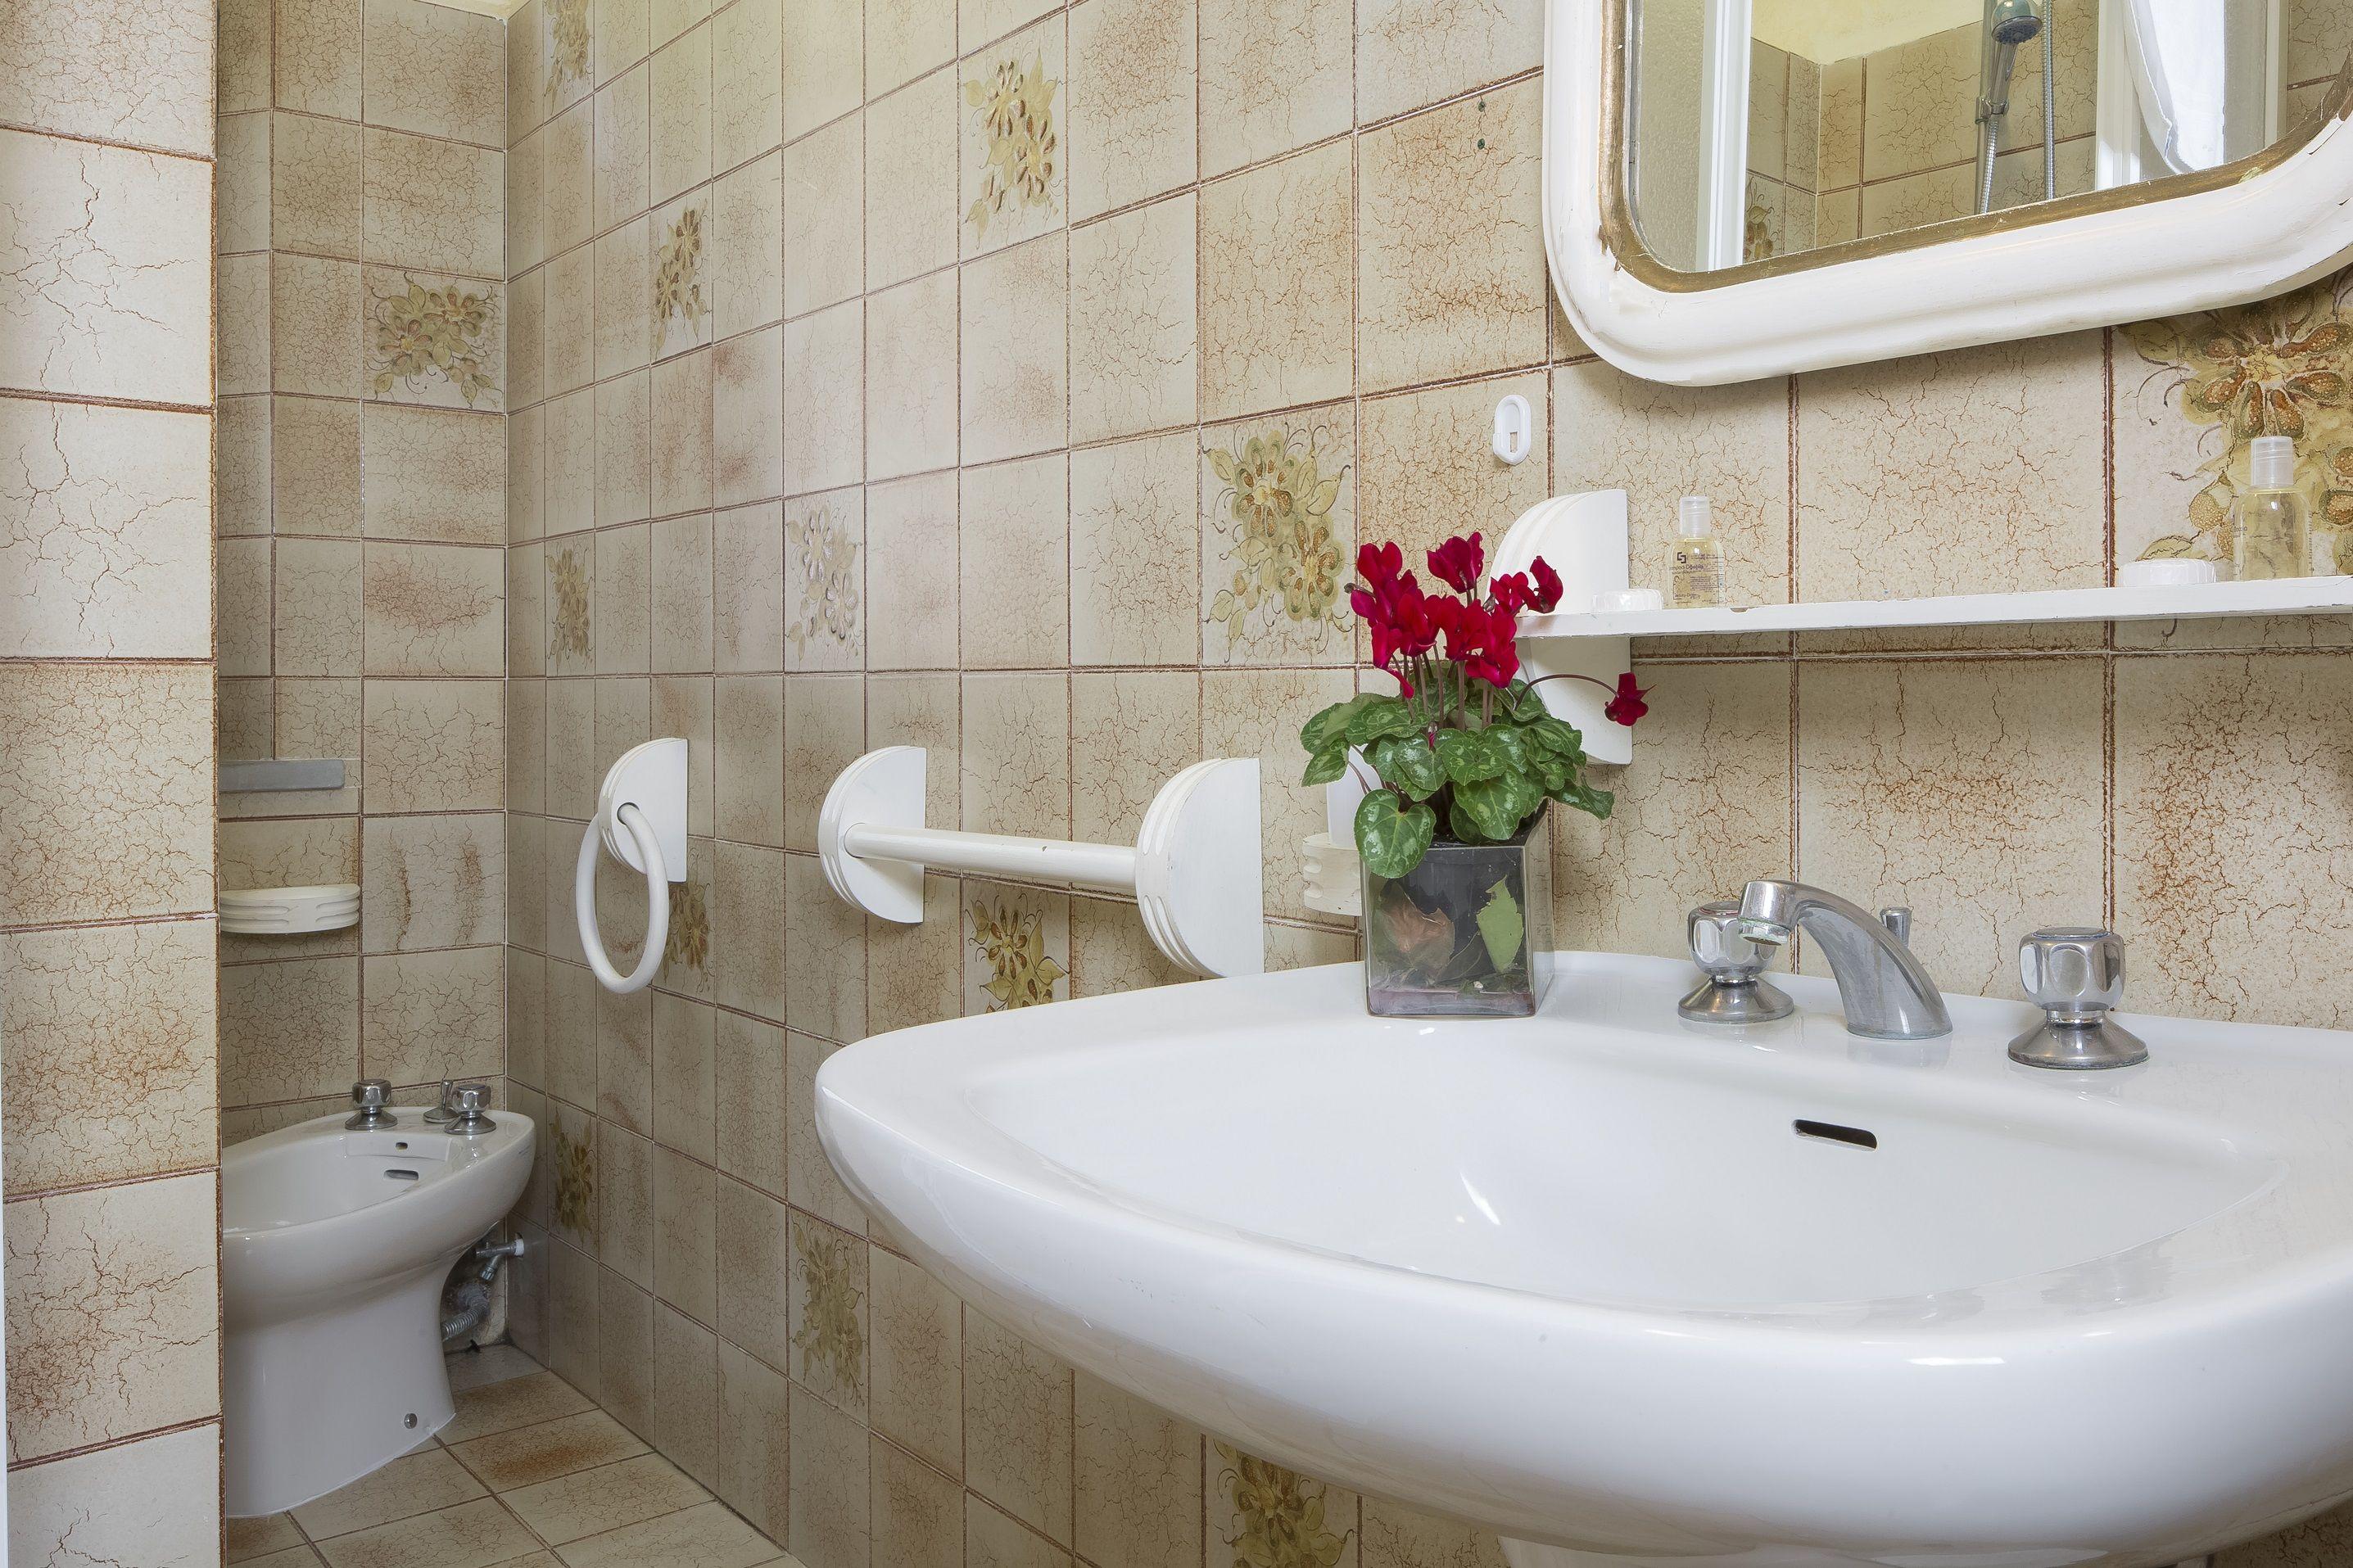 Apartment Bosco Lazzeroni Residence - Aida Holiday Home photo 18922606